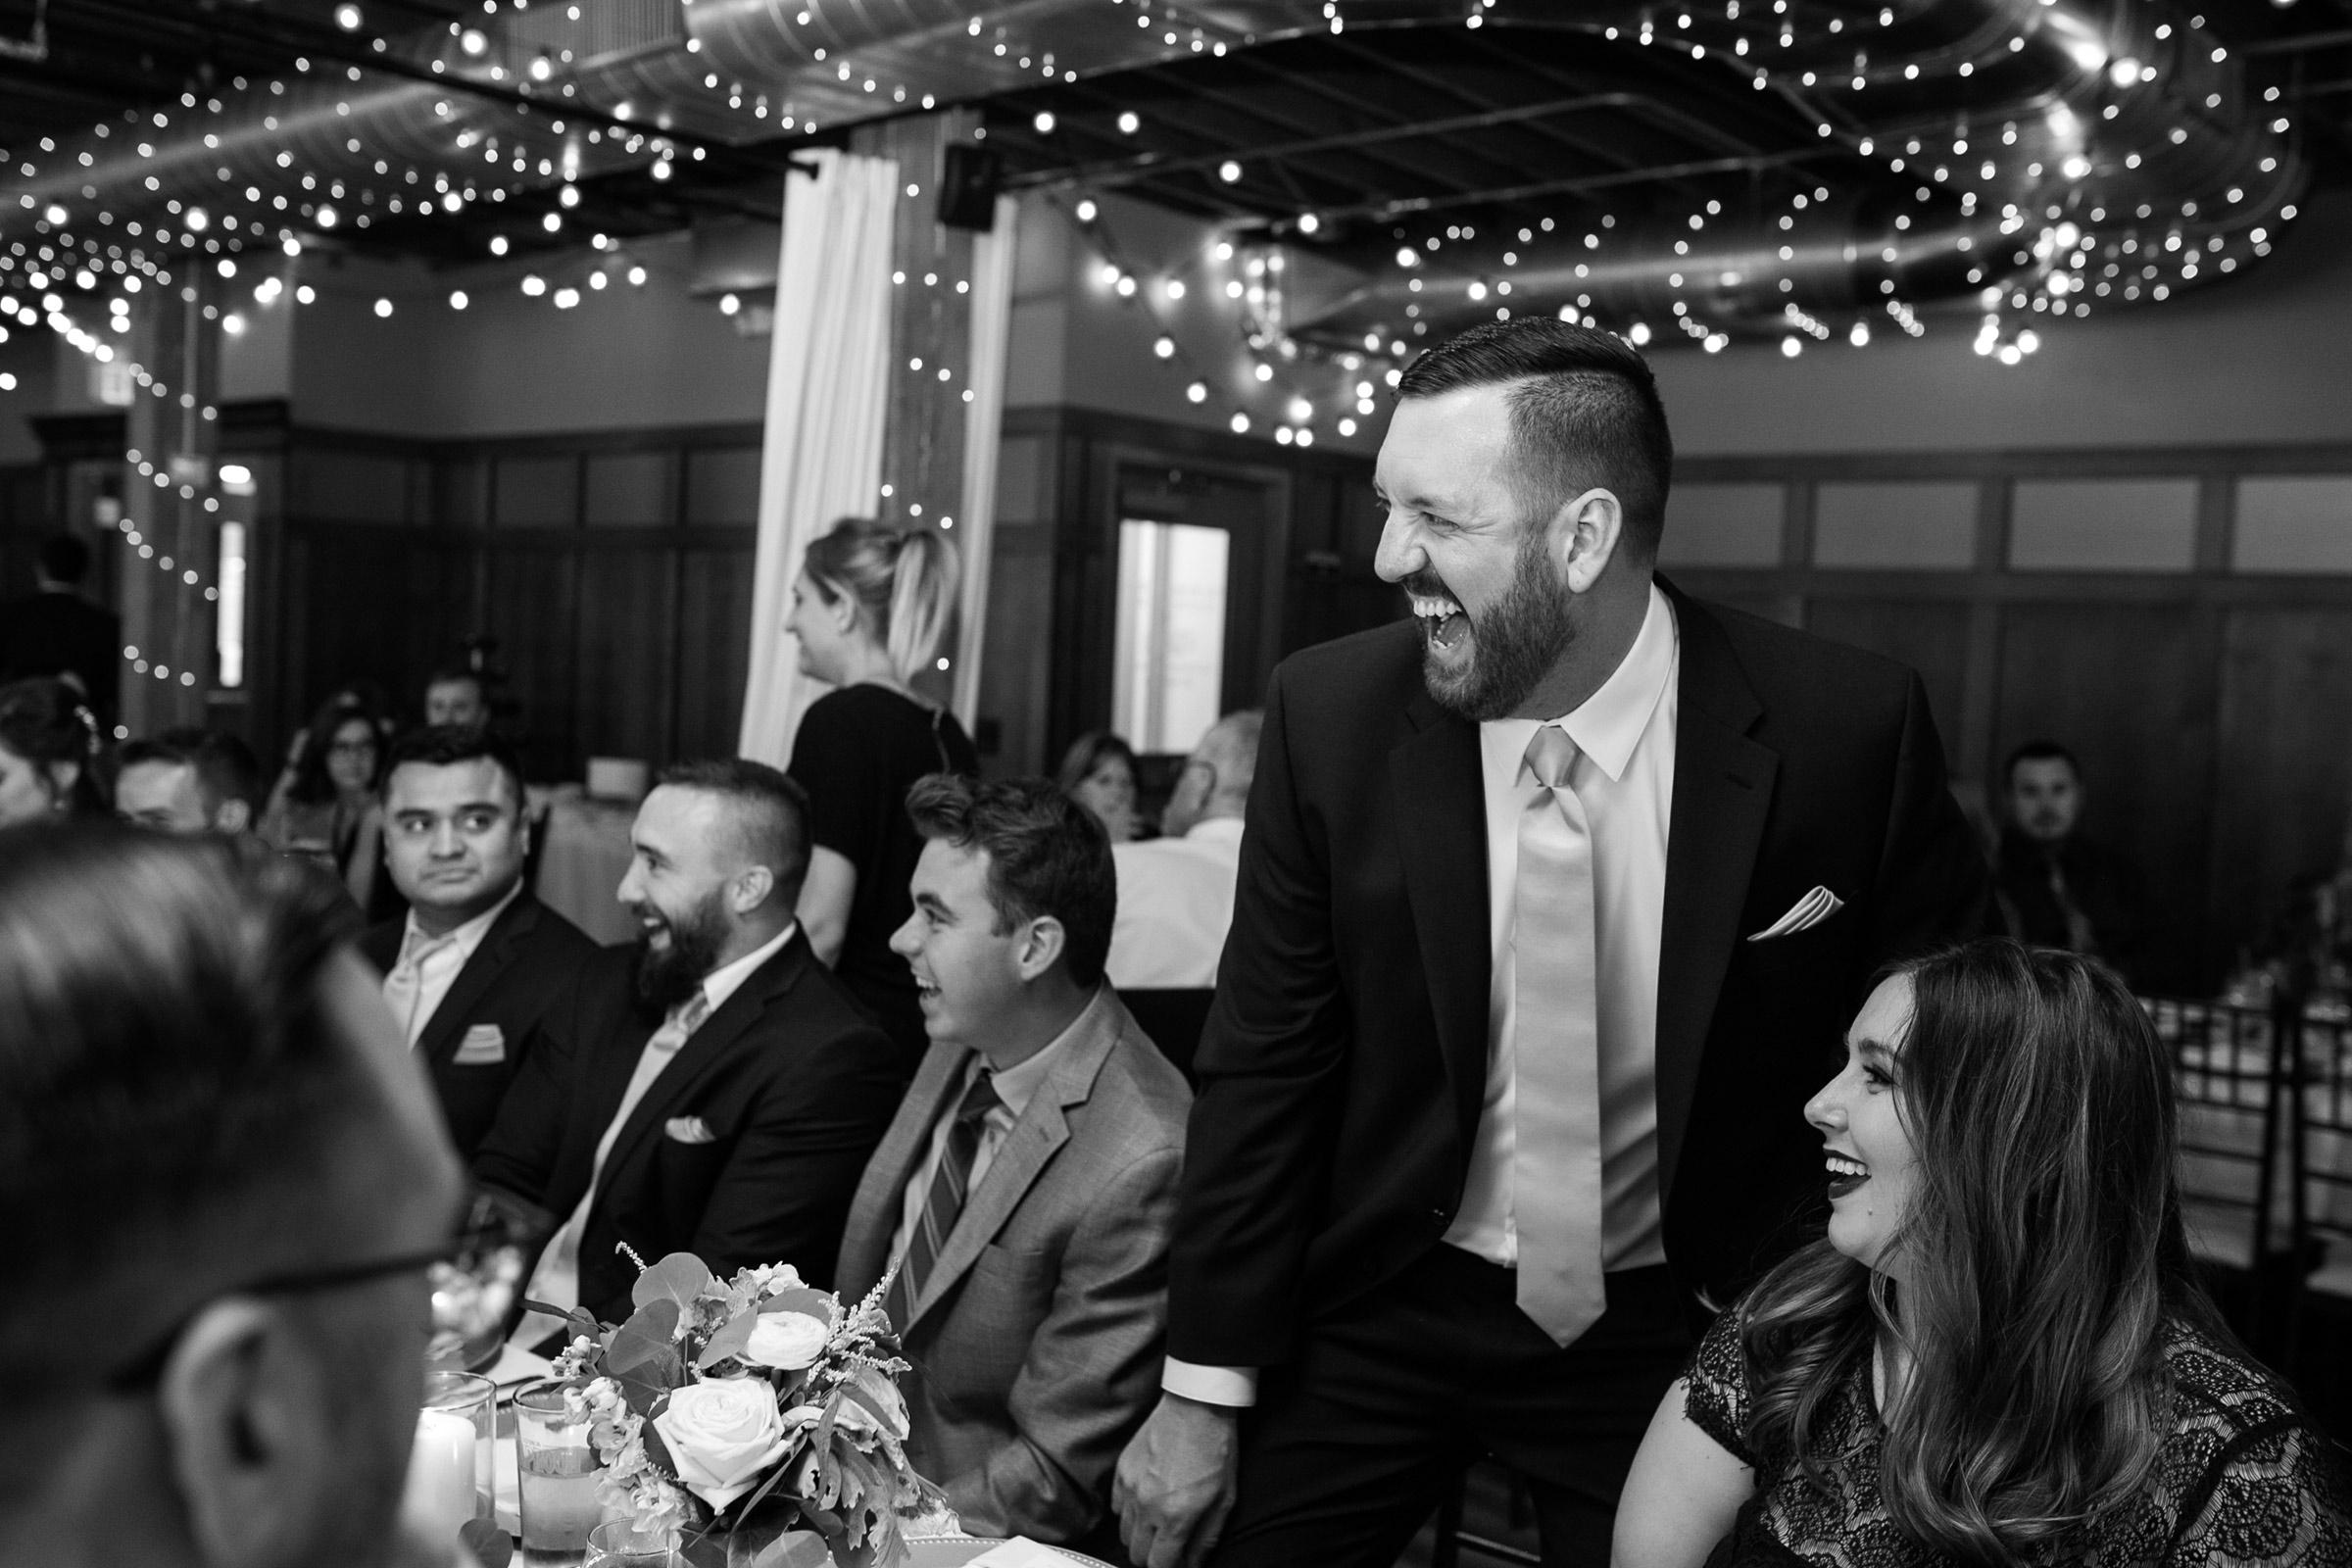 mr-mrs-hull-wedding-guest-laughing-iowa-taproom-desmoines-iowa-raelyn-ramey-photography-676.jpg